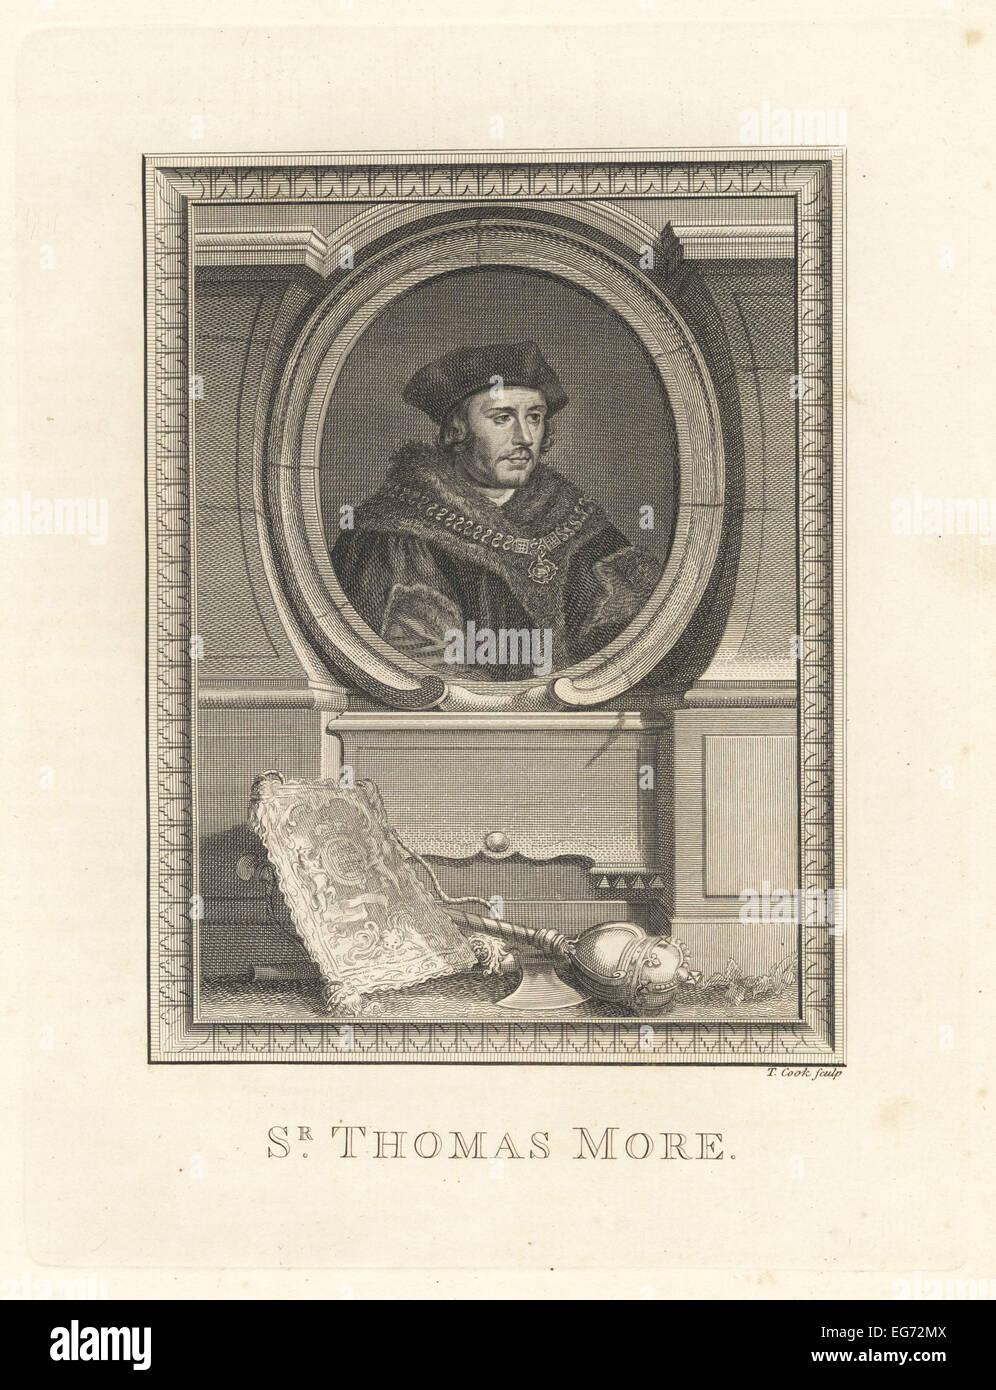 Sir Thomas More, statesman and philosopher, era of King Henry VIII, 1478-1535. - Stock Image